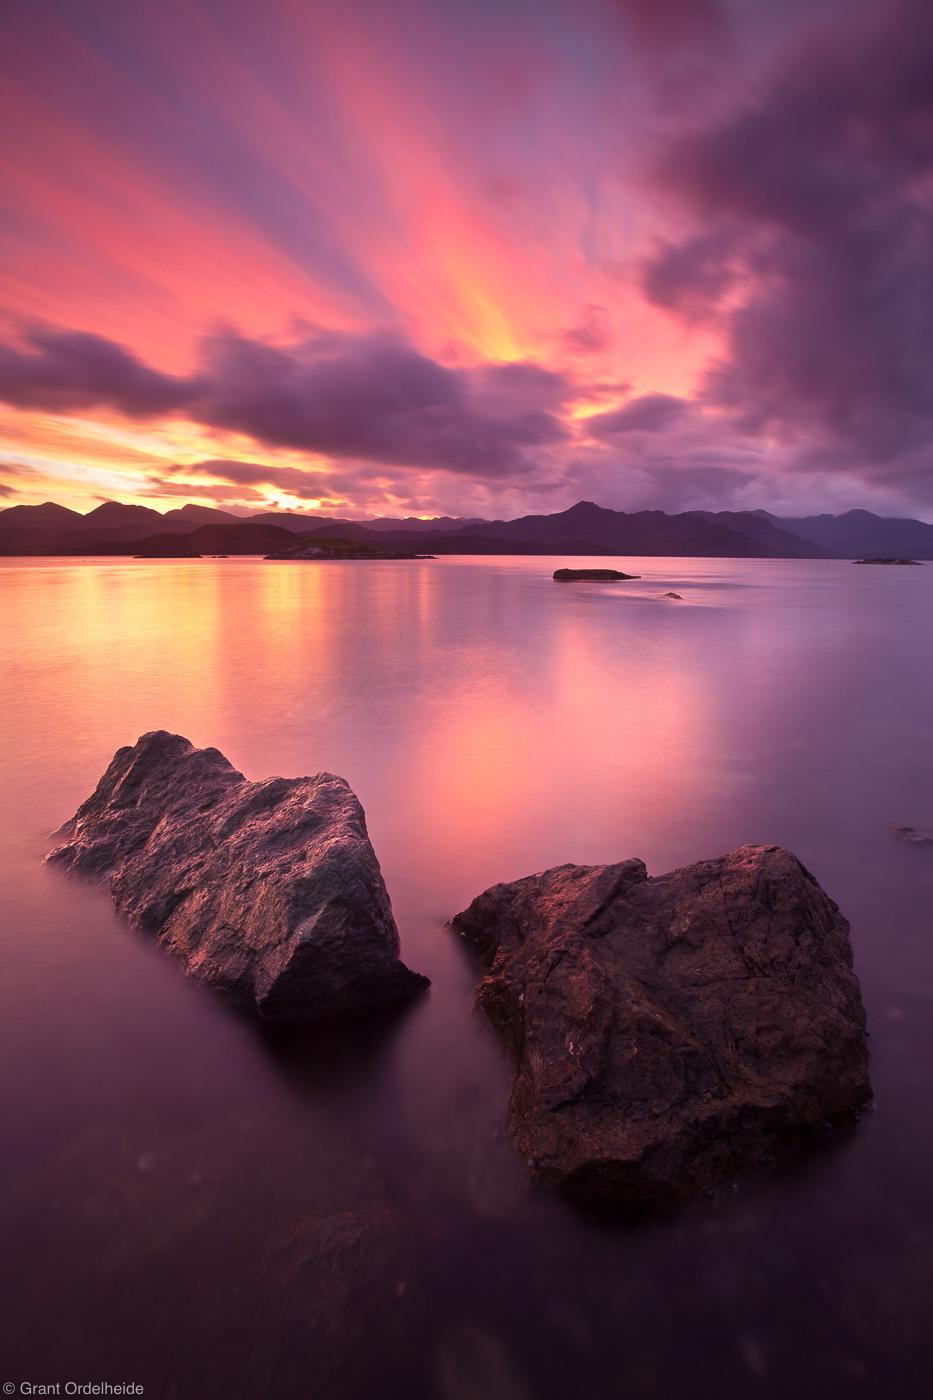 isla, tangbac, sunset, chile, remote, island, puerto, cisnes, chile, photo